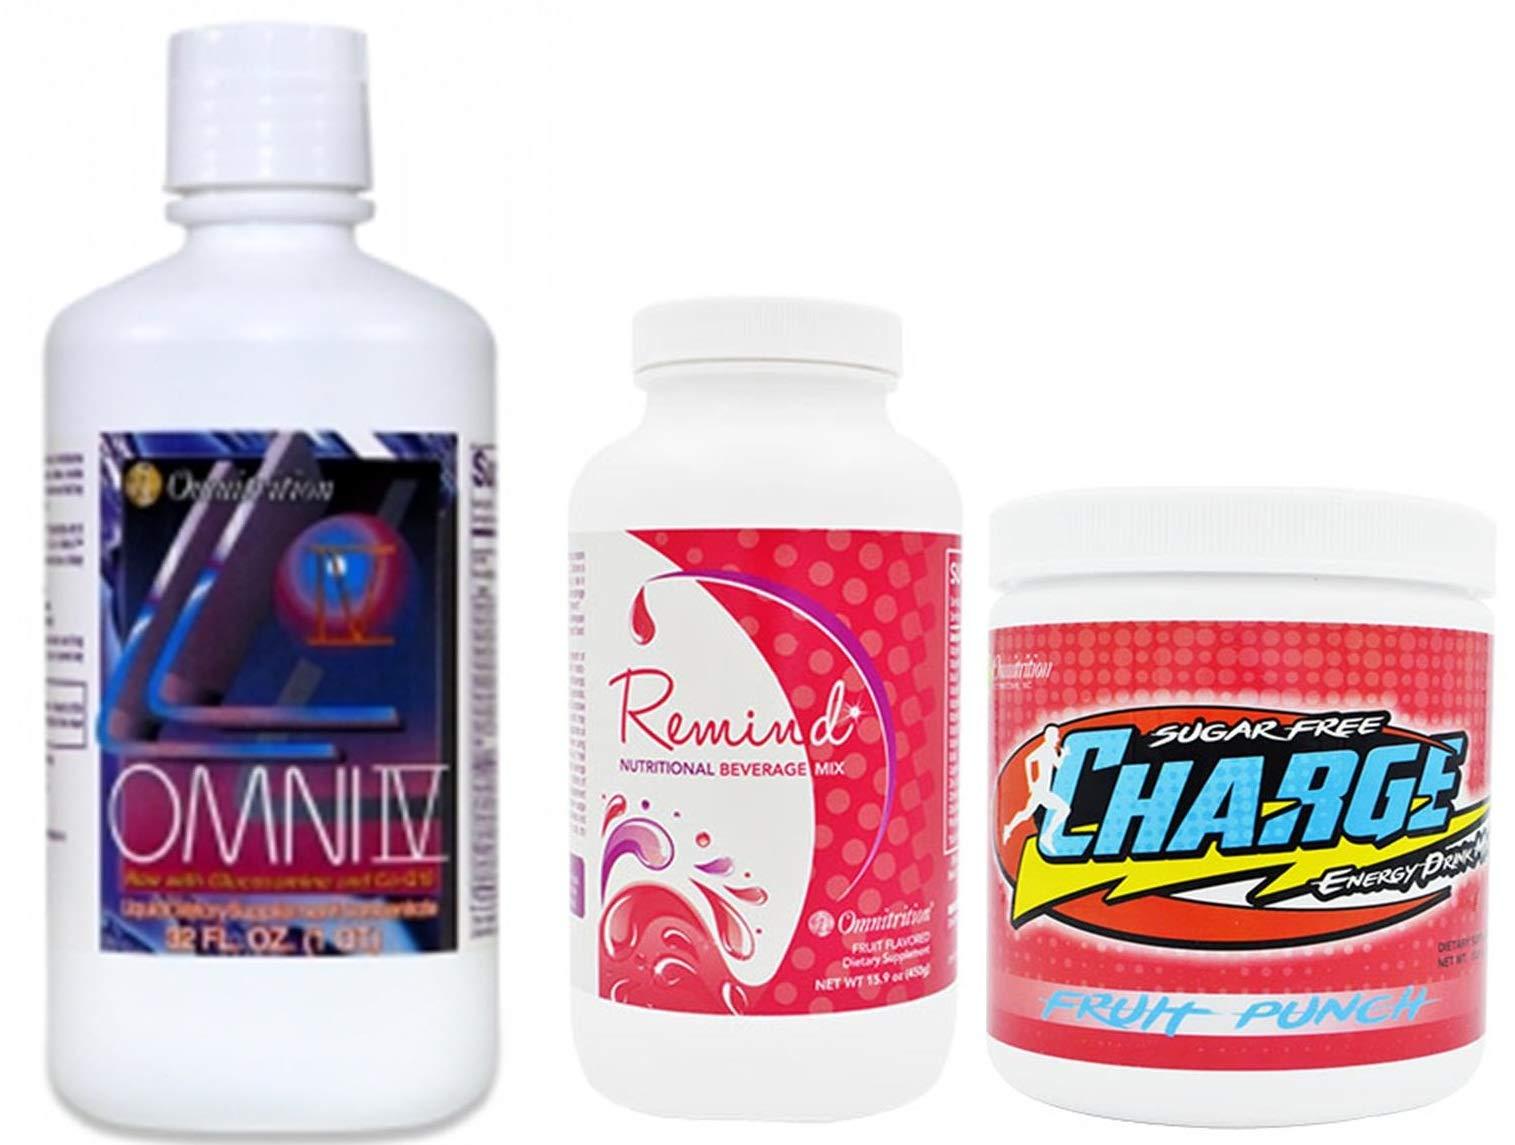 Omnitrition Bundle (Includes: Omni IV w/Glucosamine, Remind and Omni Sugar Free Fruit Punch Charge) by Generic